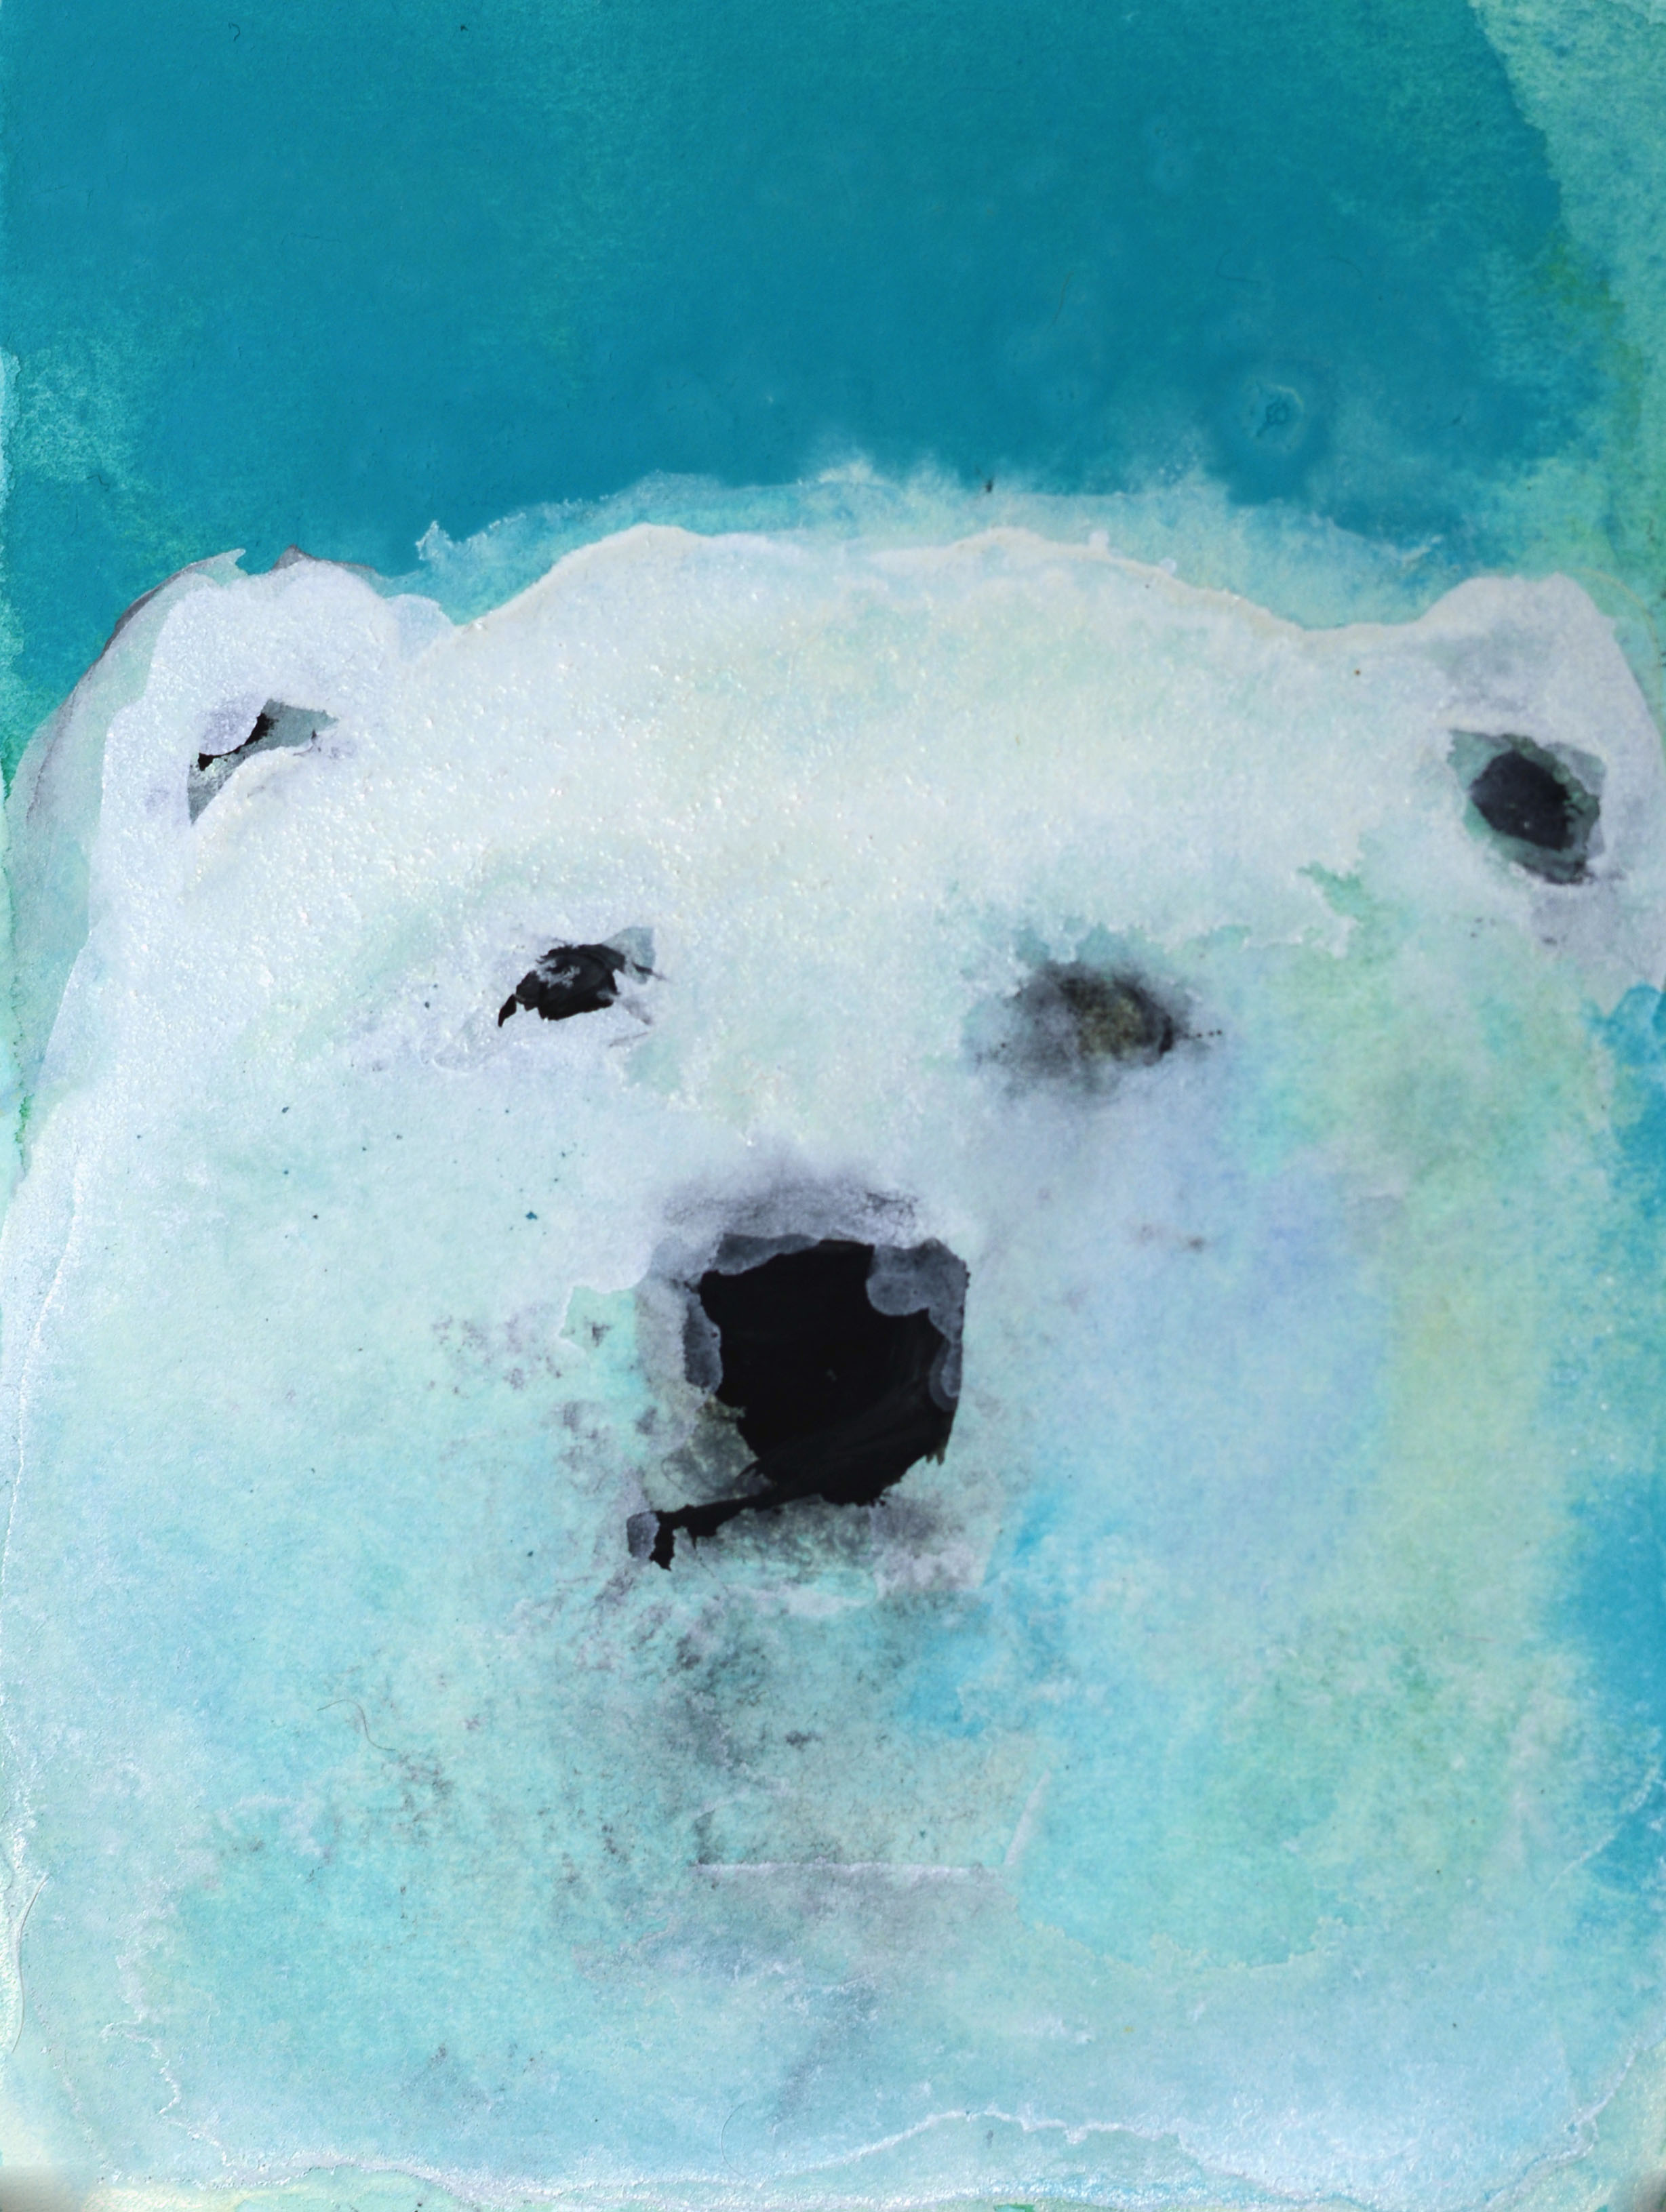 Rebecca_Kinkead_polar bear (on blue)_4x3 inset on 11x7.5 paper.jpg